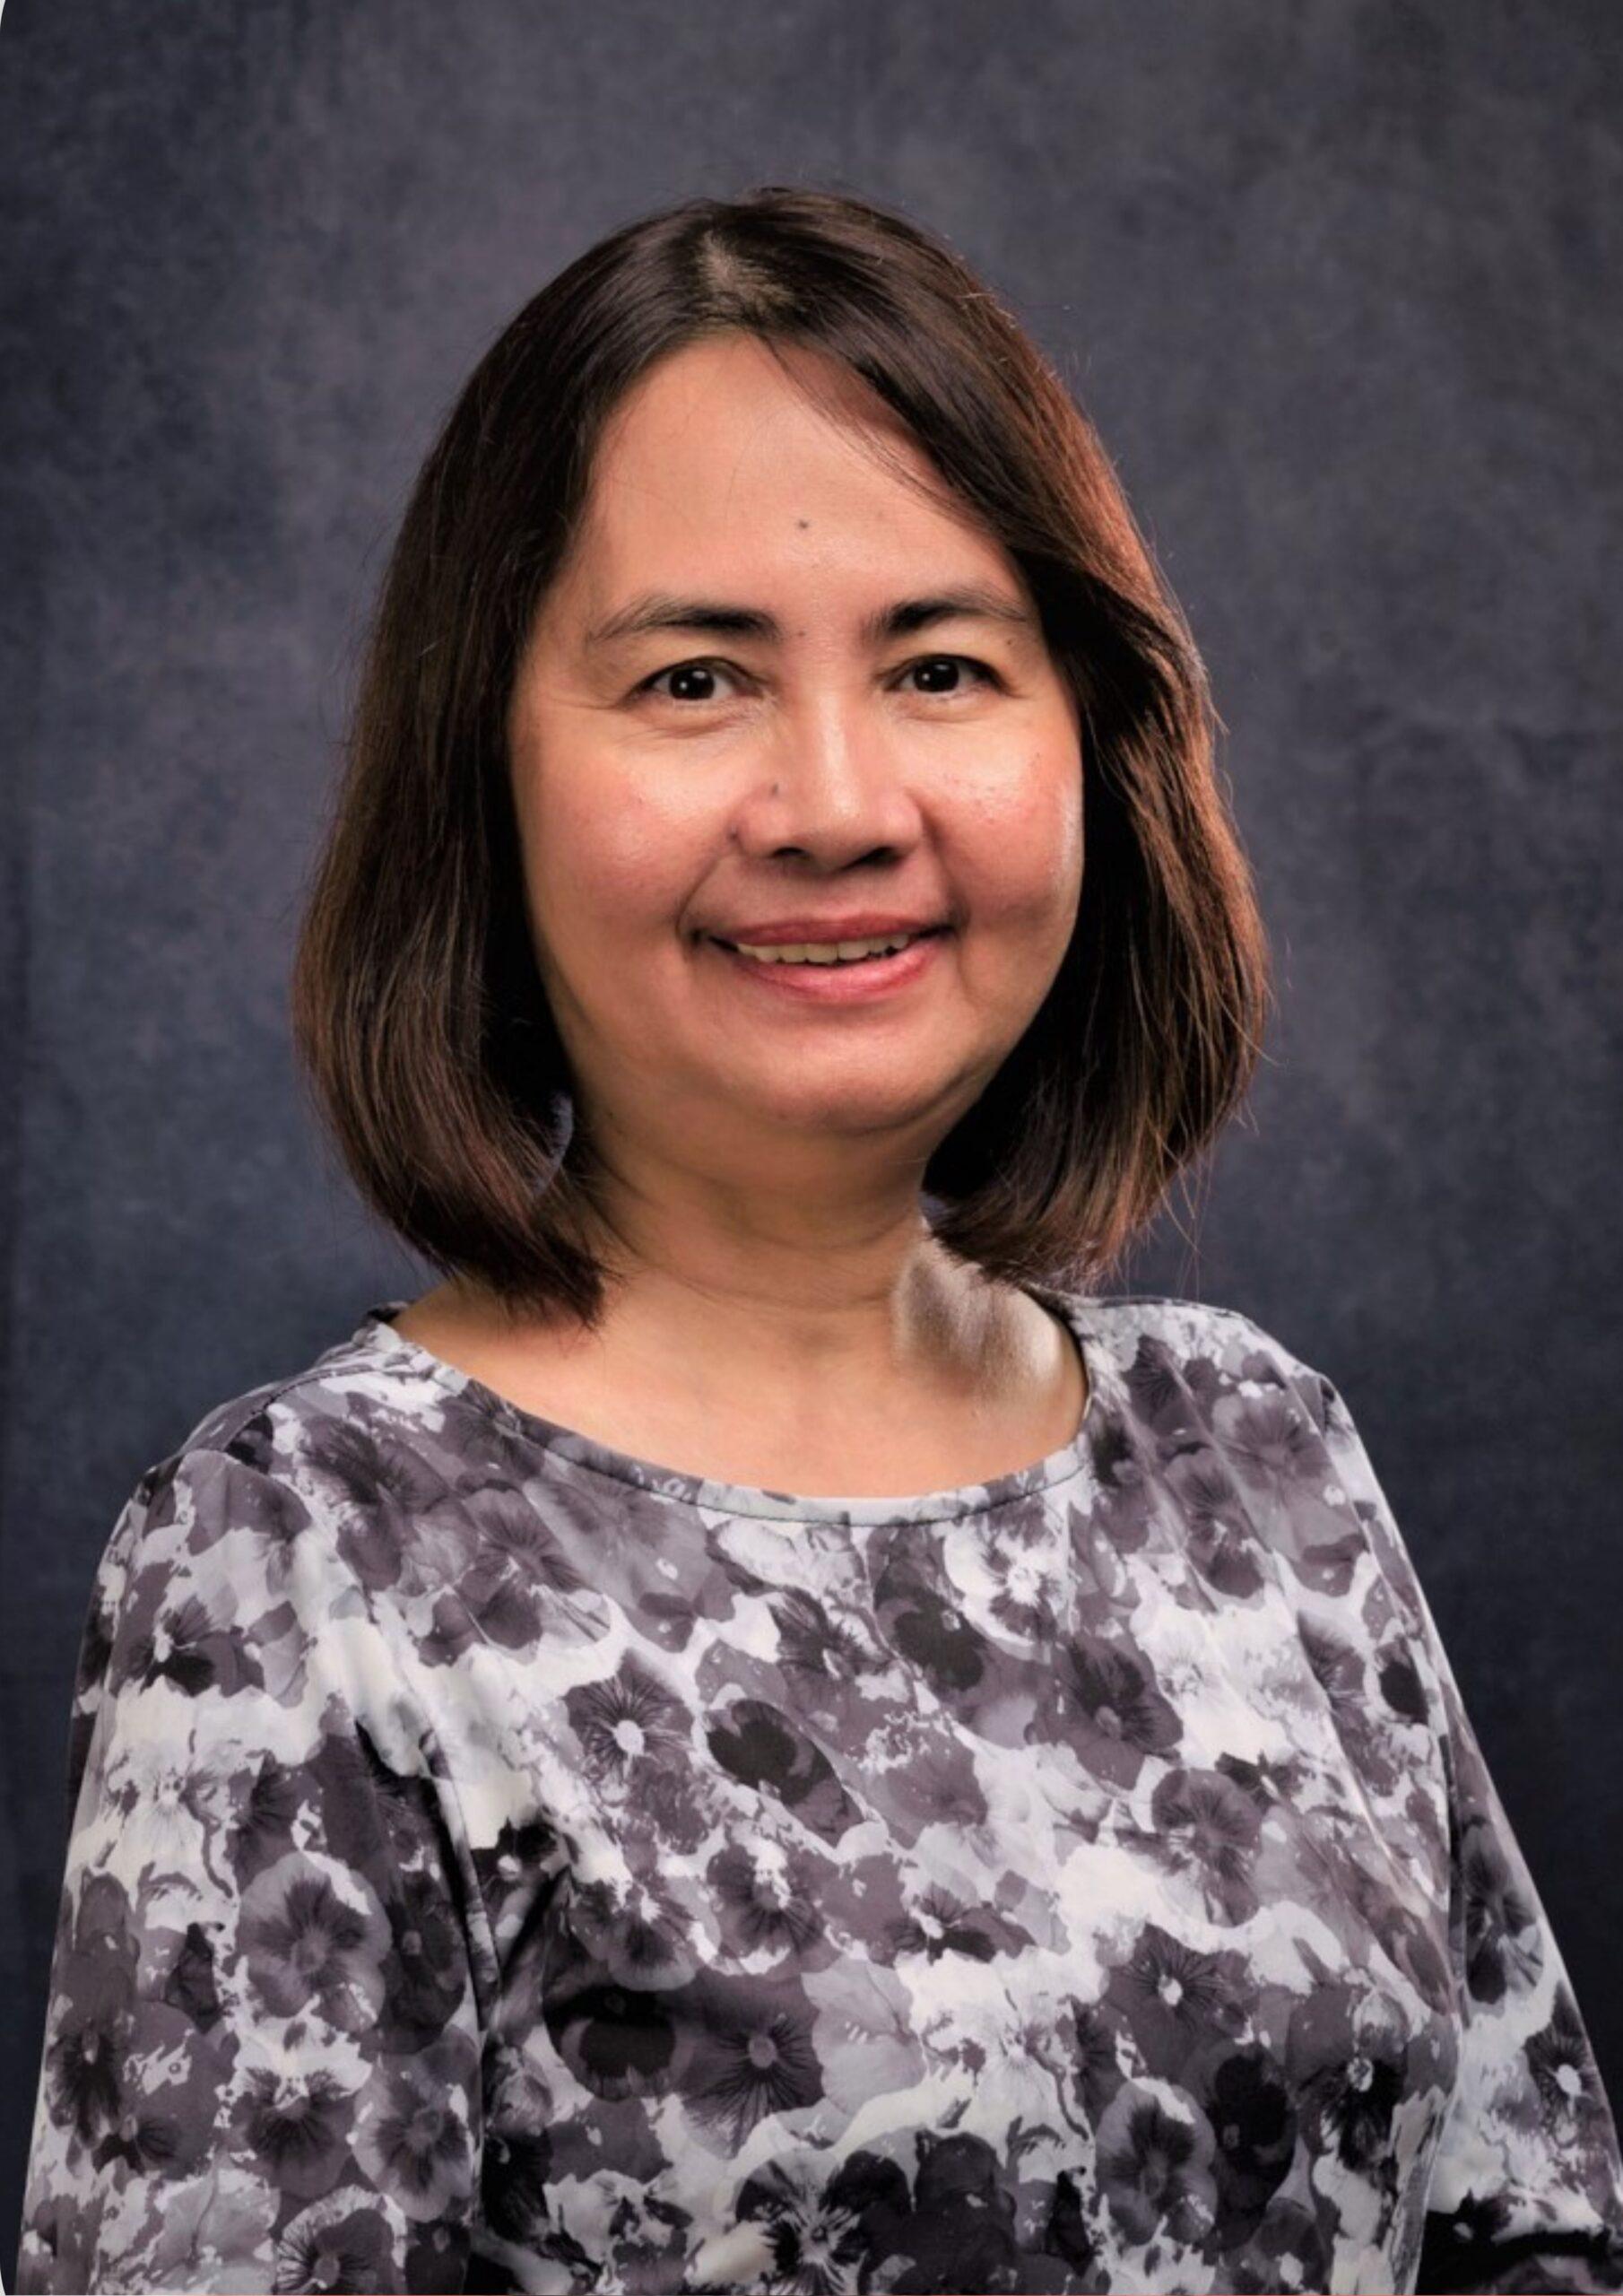 Dr. Imelda Caleon